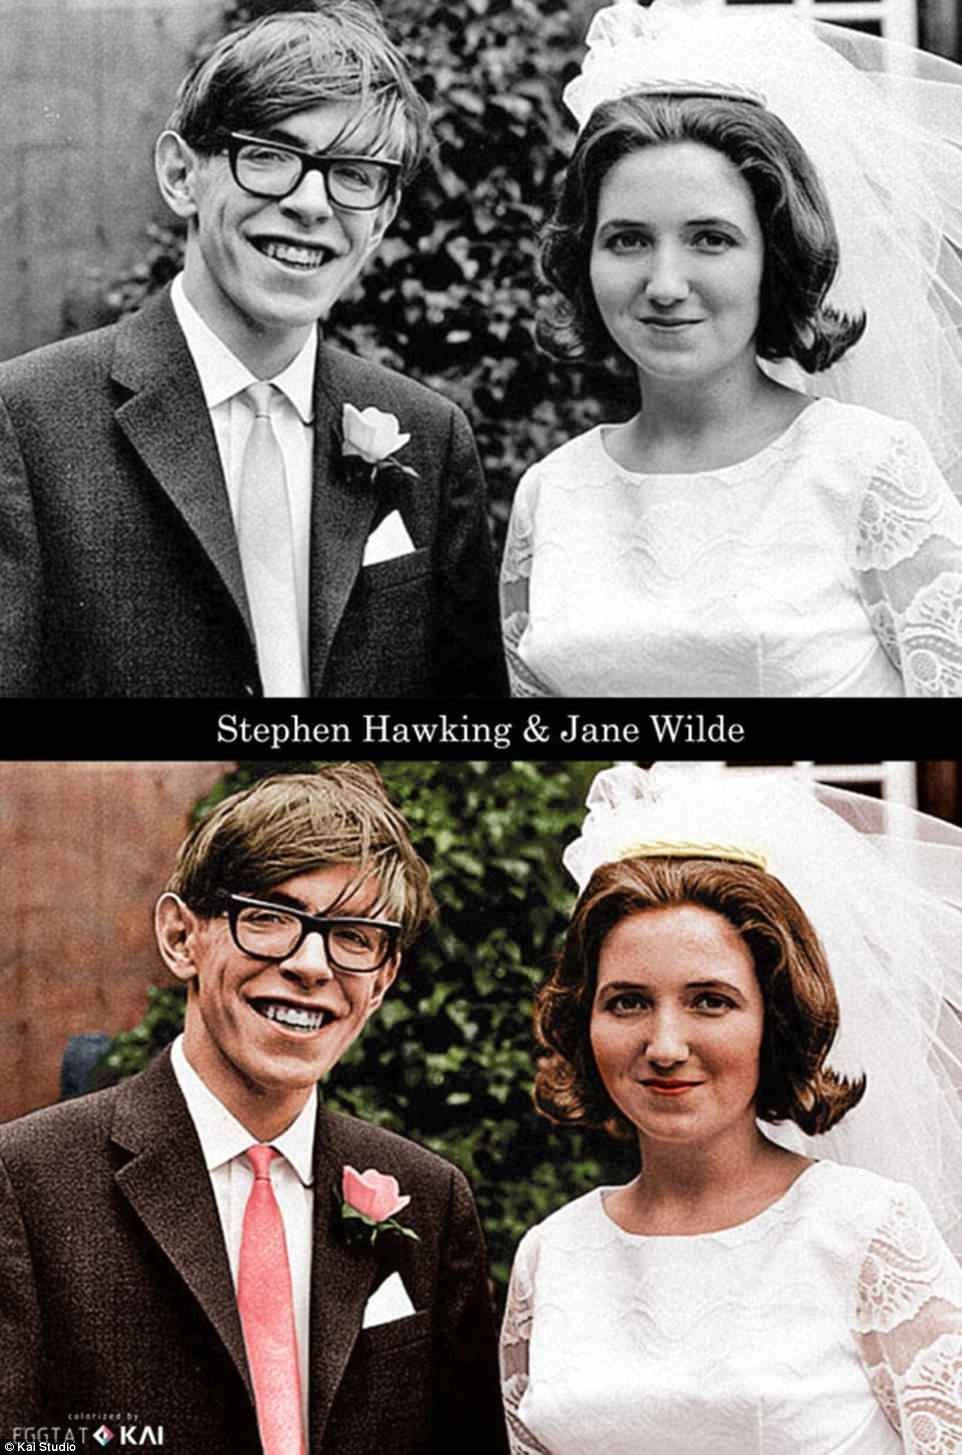 Stephen hawking and wife